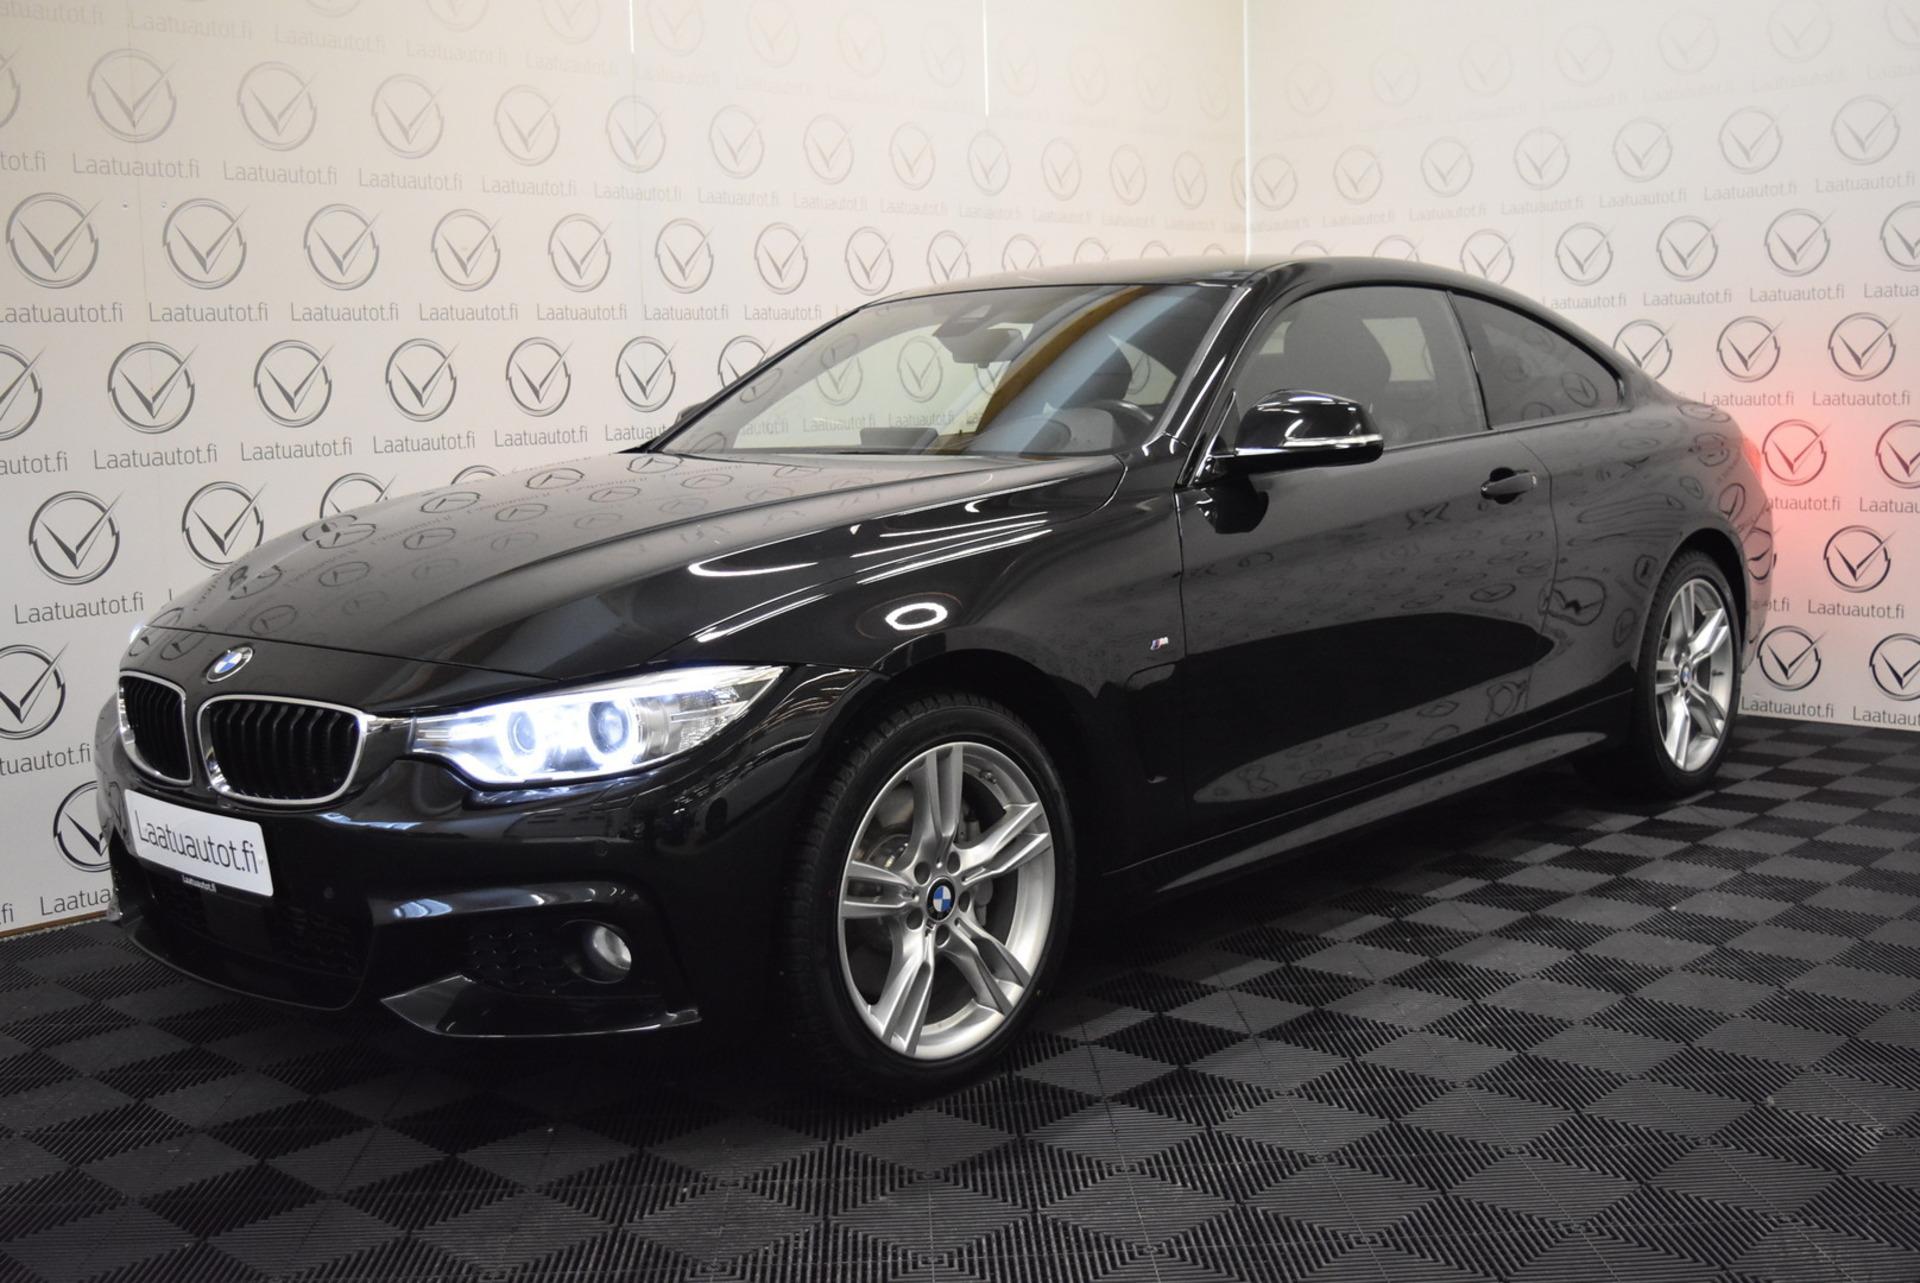 BMW 435 F32 Coupe 435d A xDrive M Sport - Korko: 1, 89% + kulut! Jopa ilman käsirahaa! HUD,  Adaptiivinen cruise,  Hifi,  Navi,  Nahat